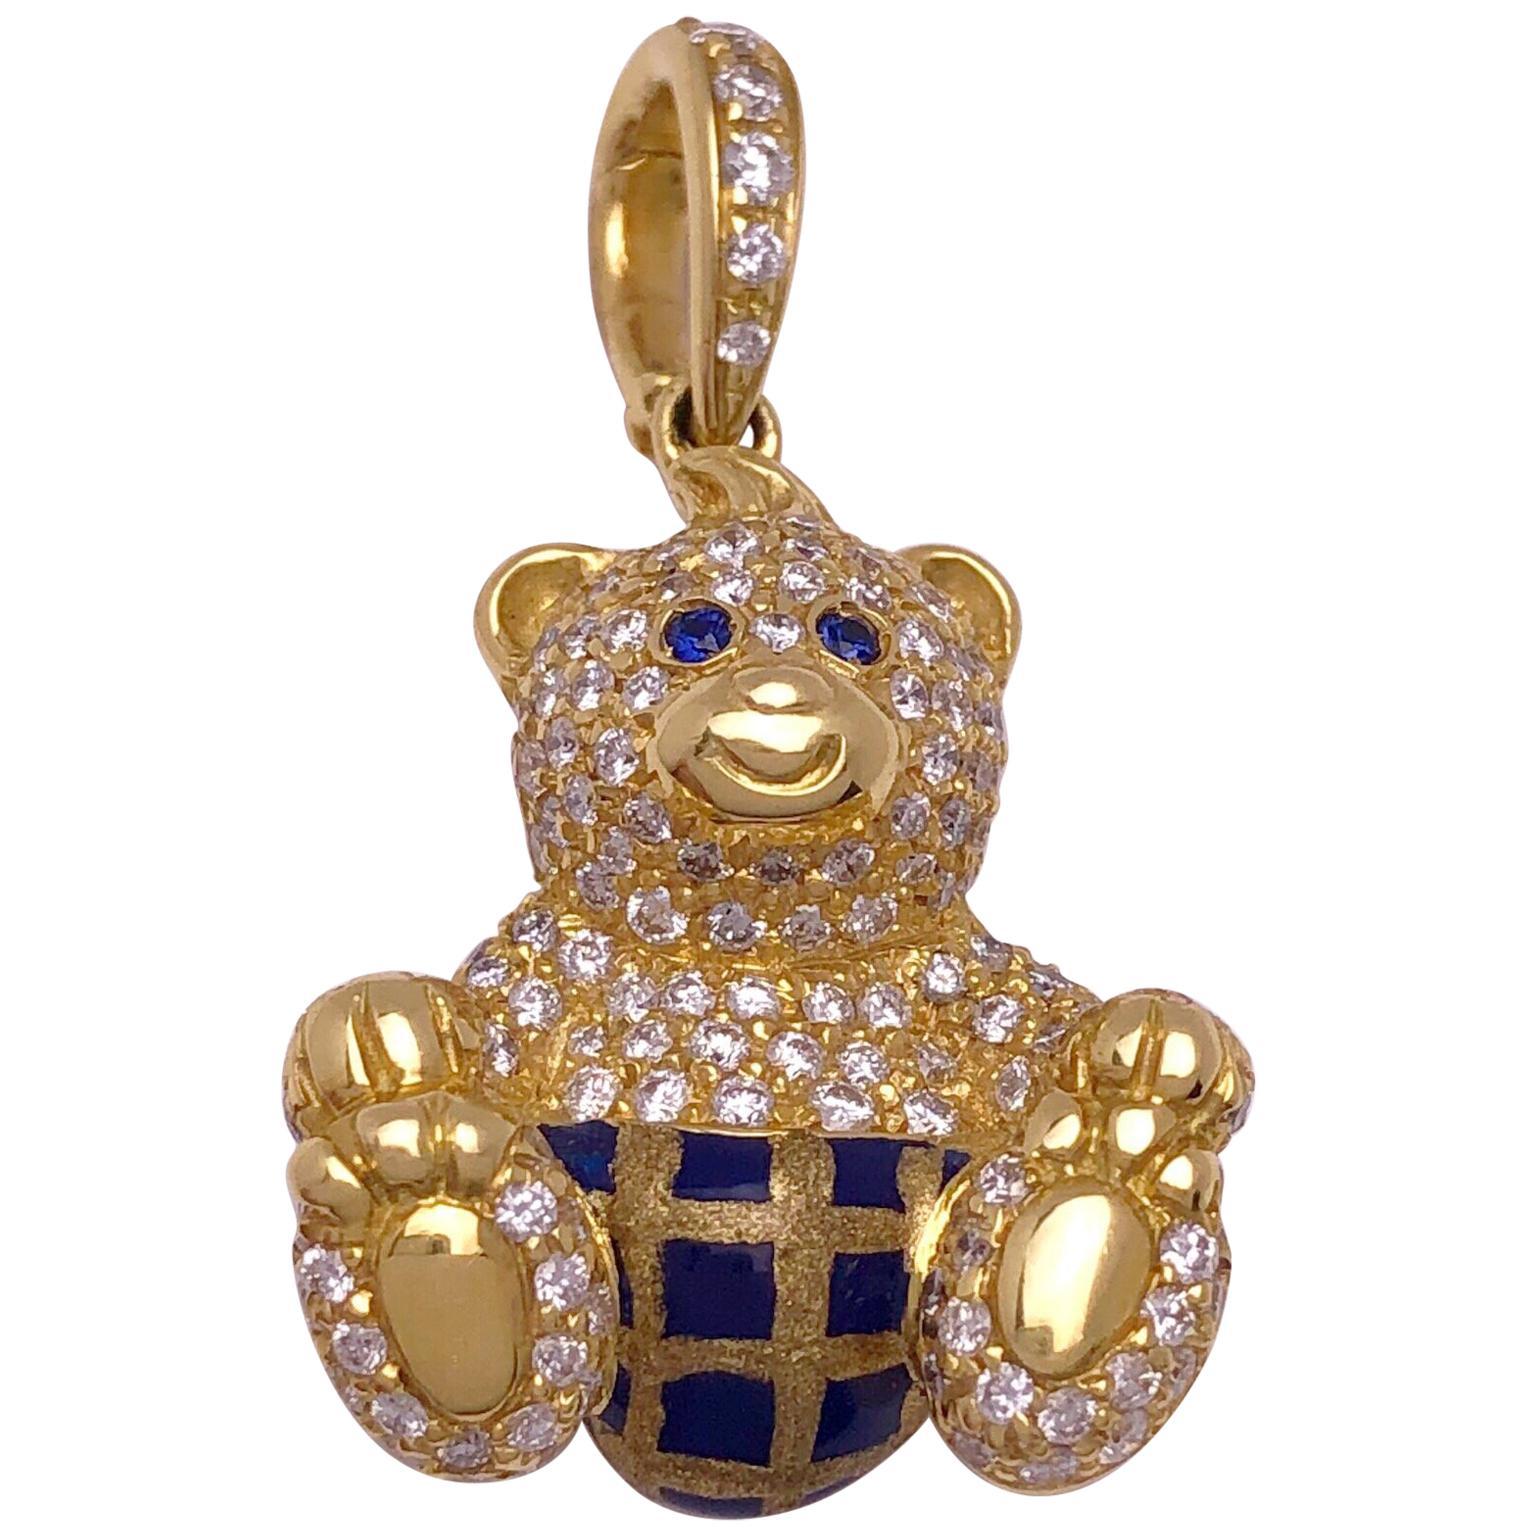 18 Karat Yellow Gold, 1.07 Carat Diamond and Enamel Teddy Bear Charm